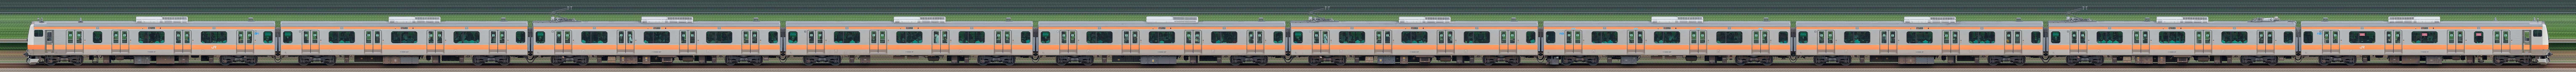 JR東日本 中央快速線 E233系T37編成(トイレ設置後・海側)の編成サイドビュー